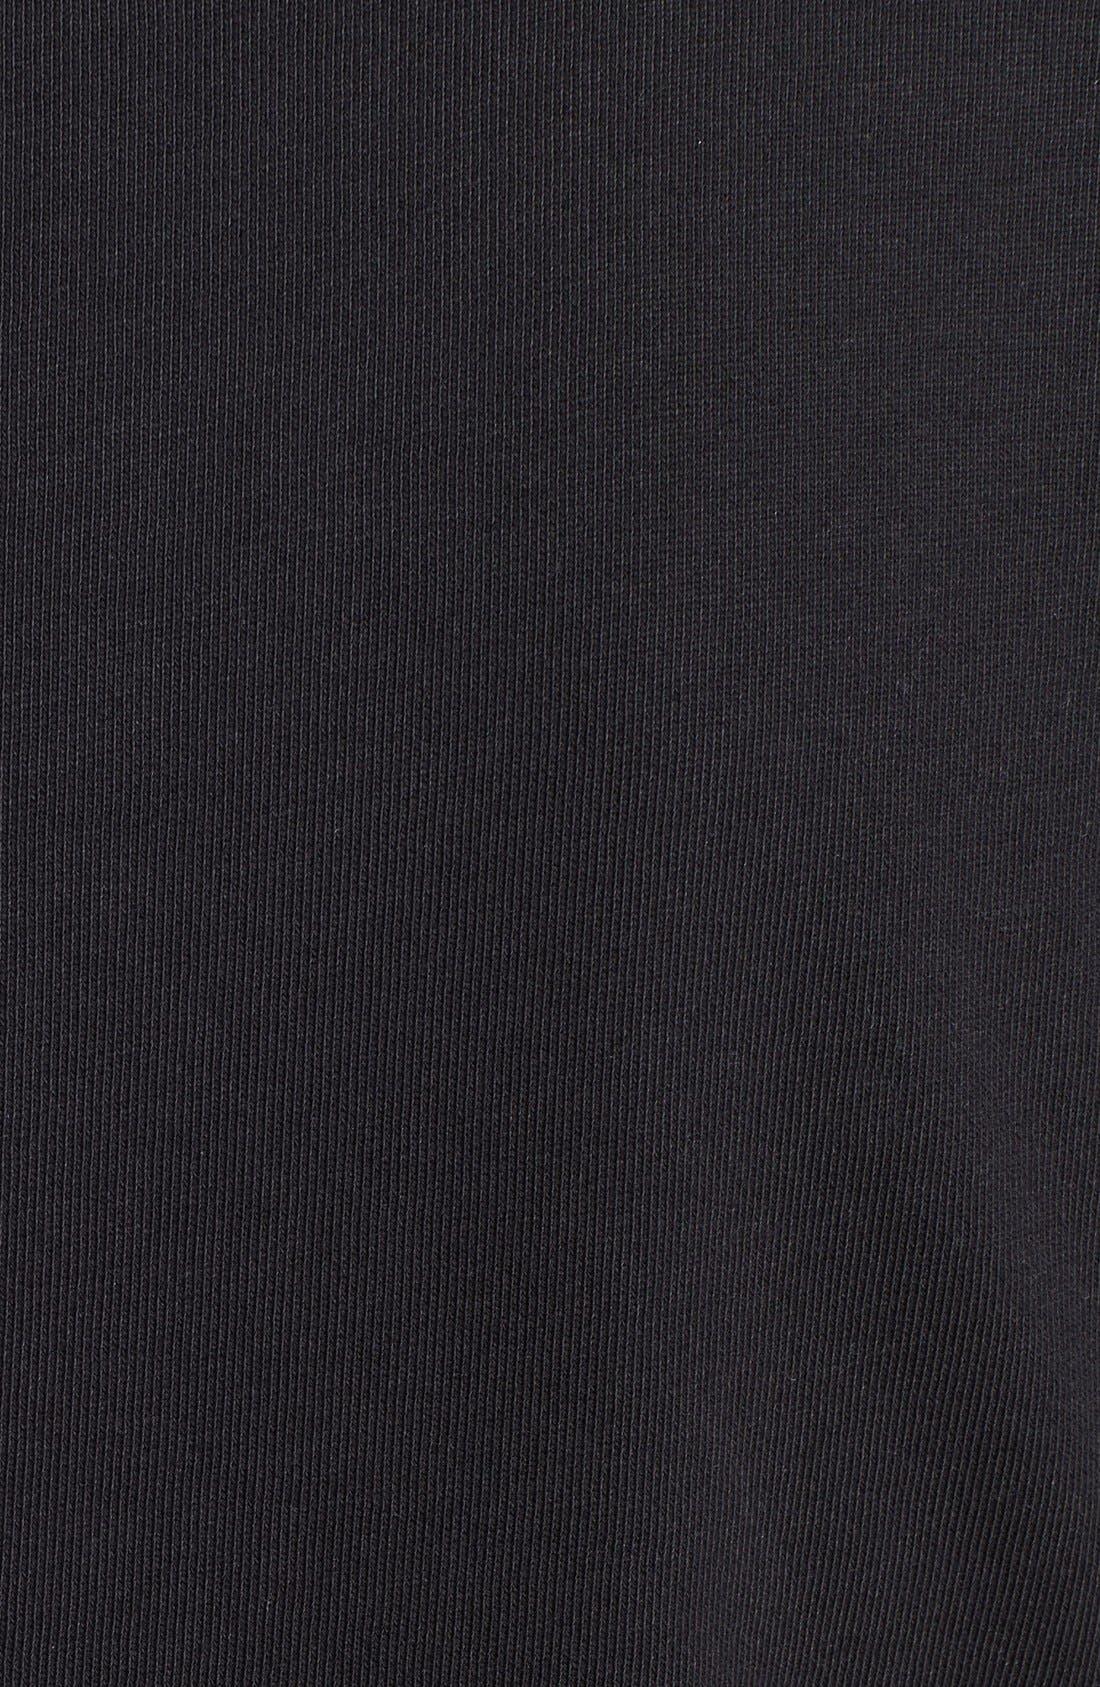 Alternate Image 3  - Vince Faux Leather Shoulder Trim Sweatshirt